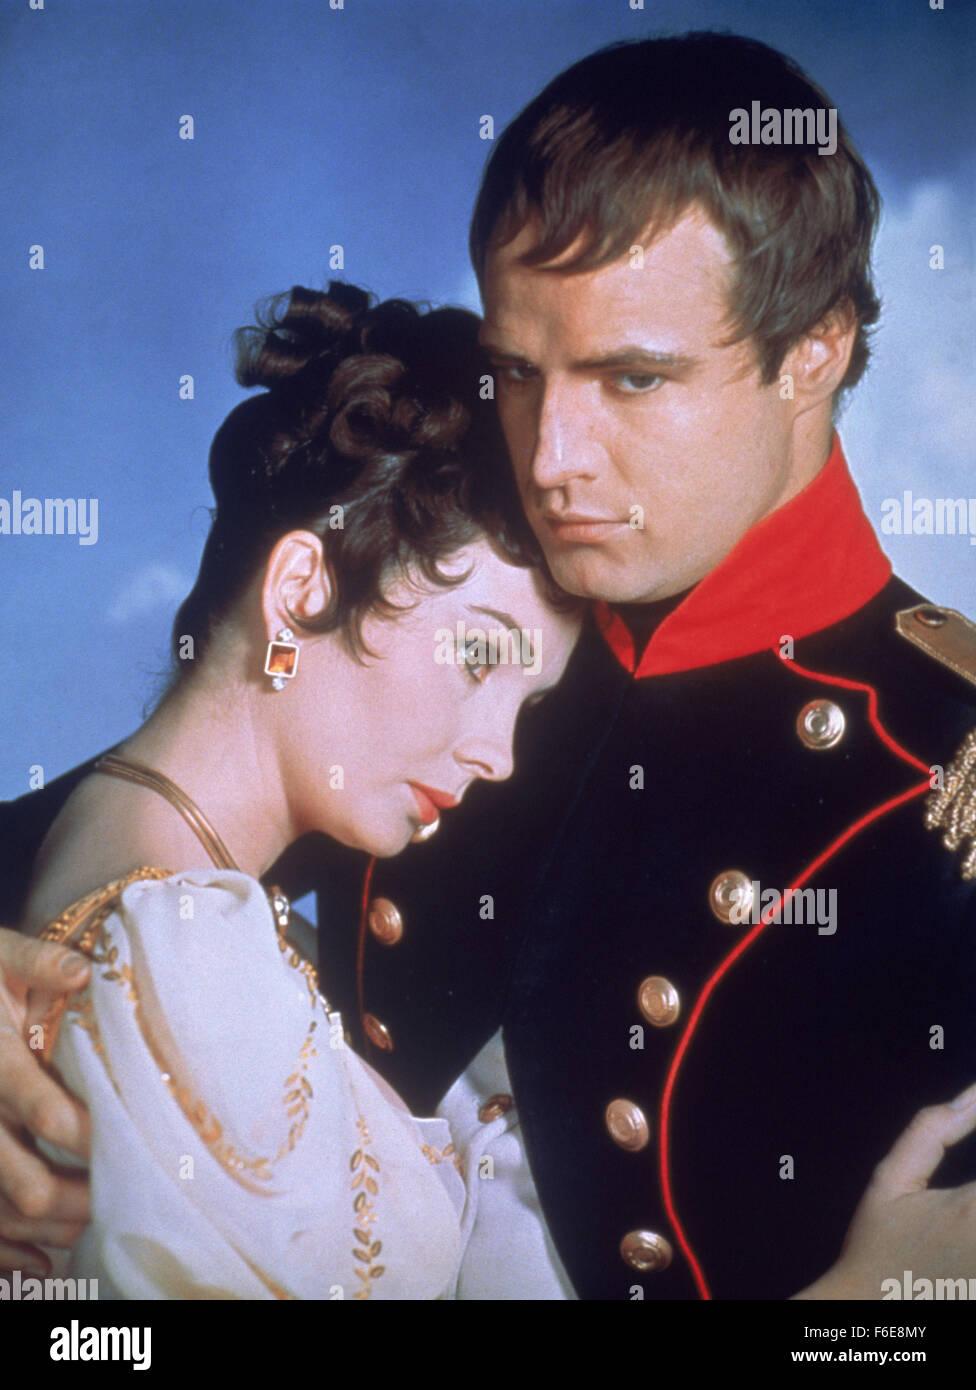 date de sortie   novembre 17  1954  titre du film   desiree  studio   twentieth century